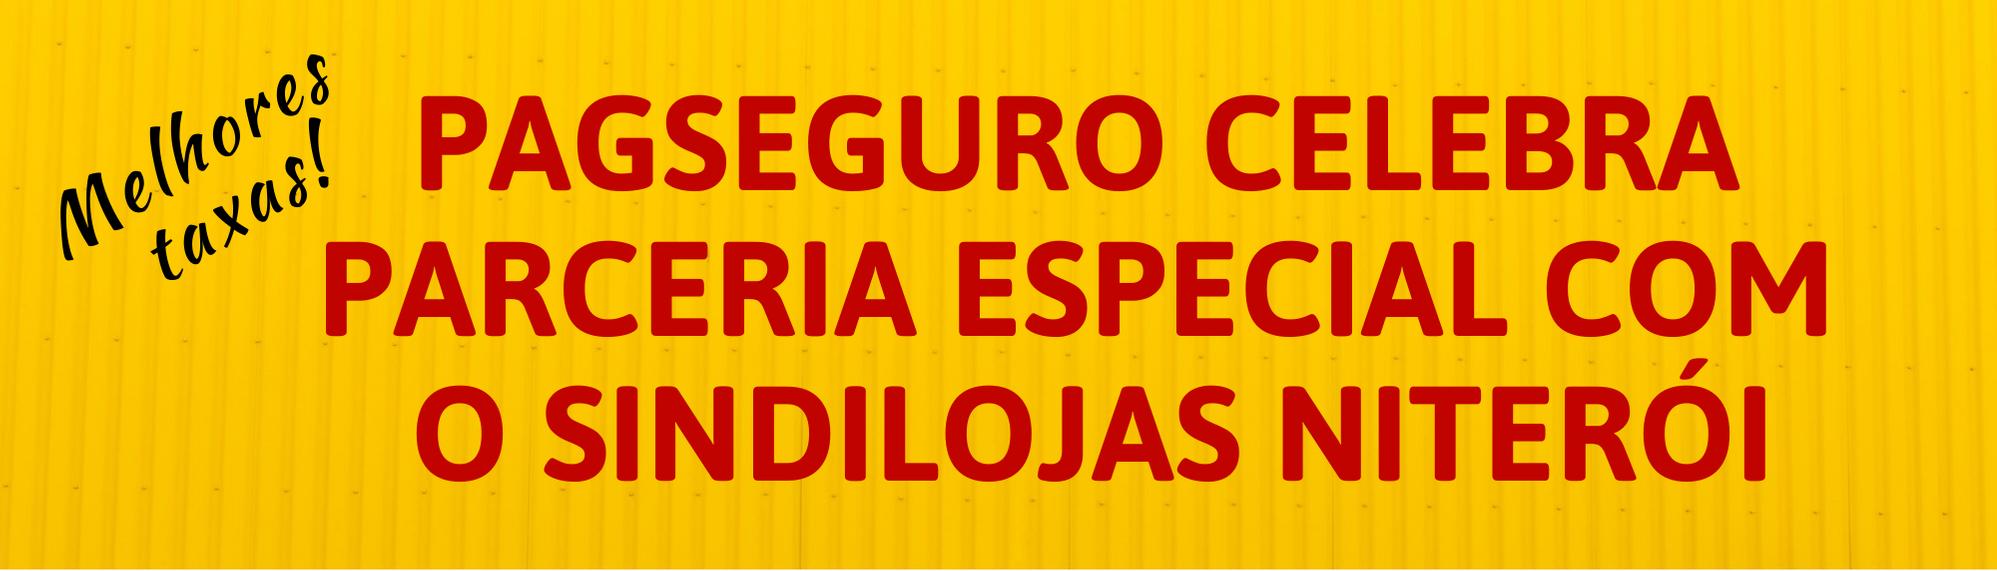 banner_pagseguro